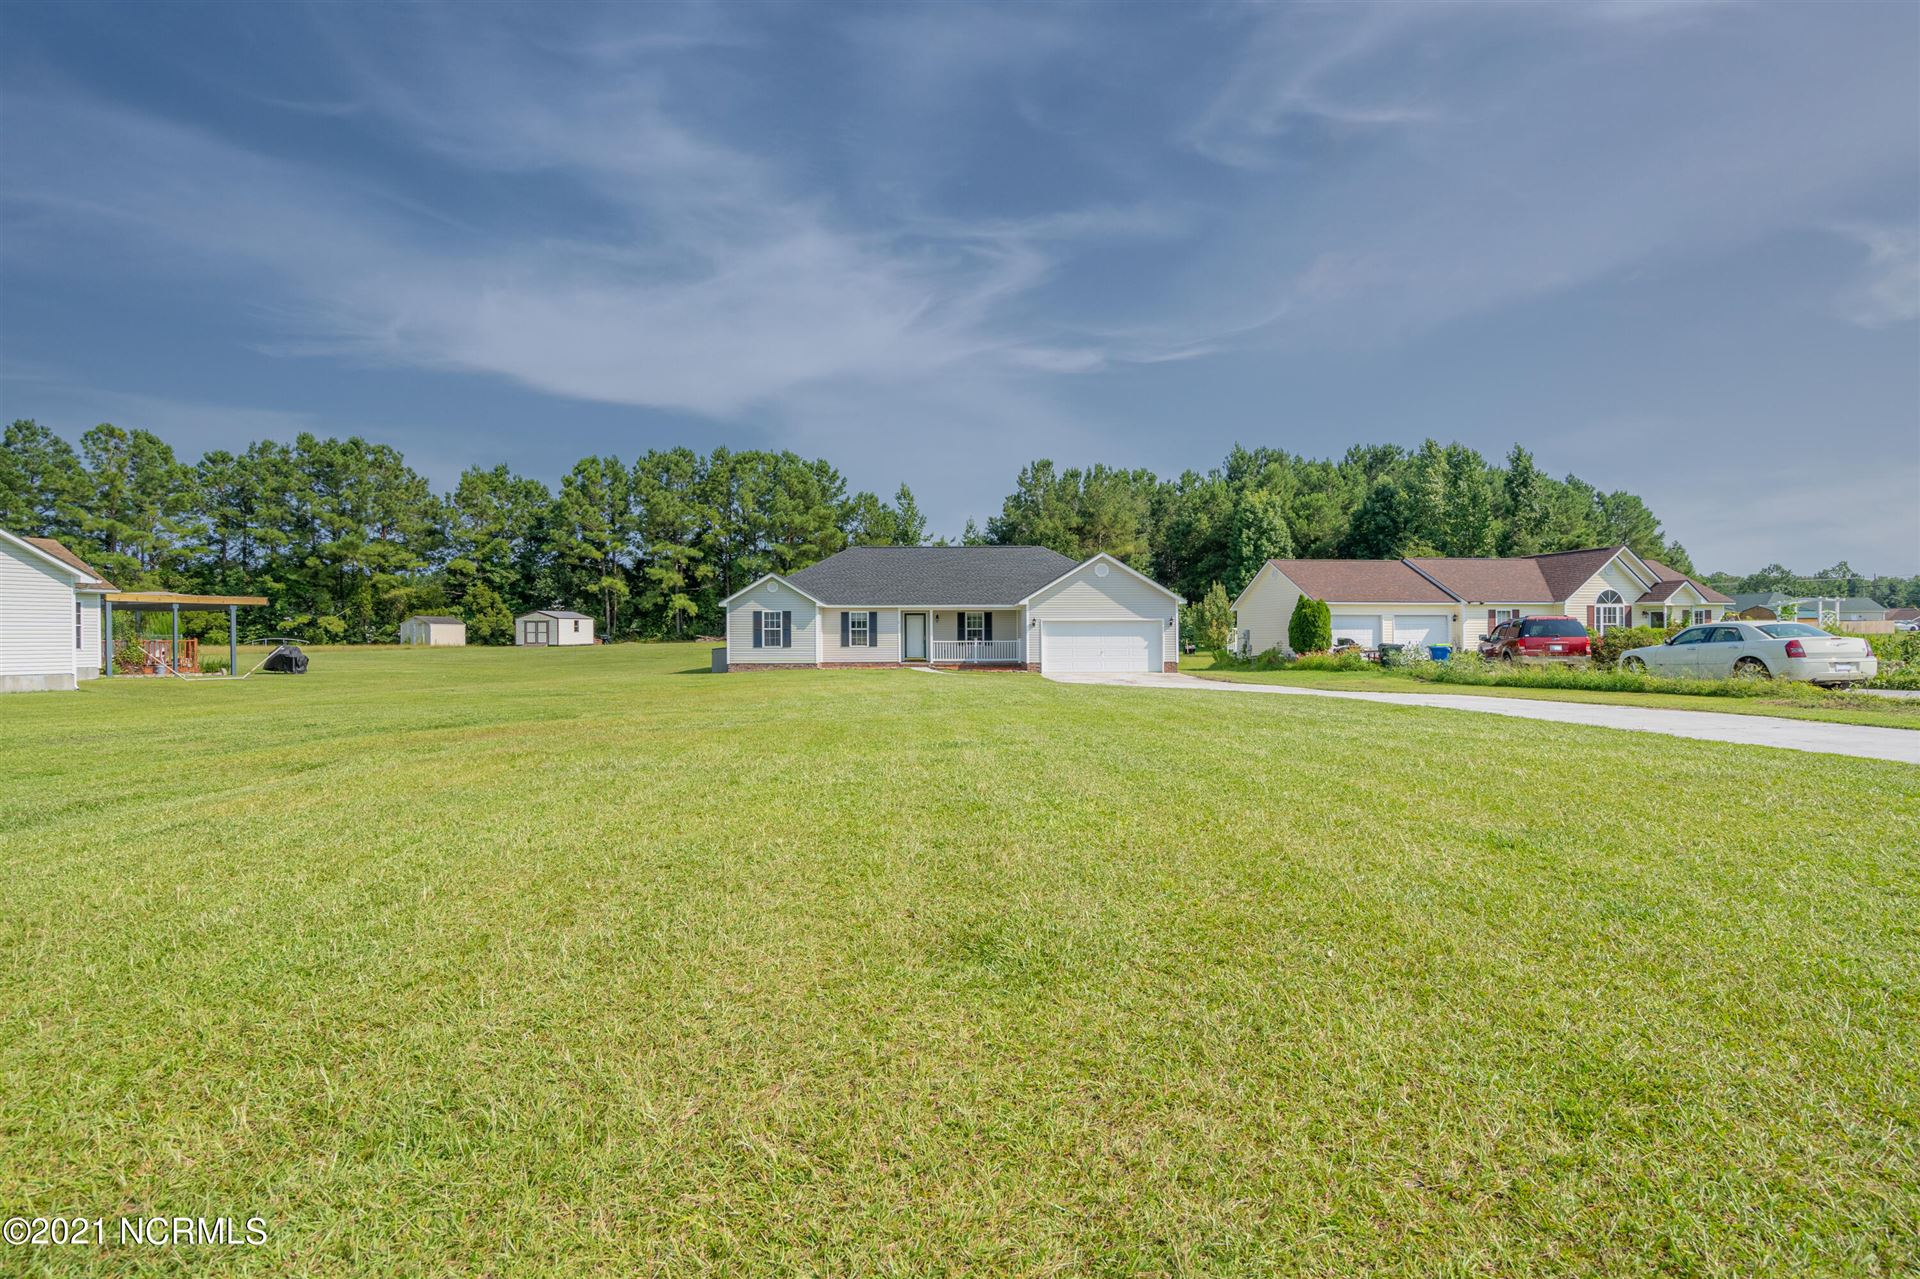 Photo of 210 Brookstone Way, Jacksonville, NC 28546 (MLS # 100285852)